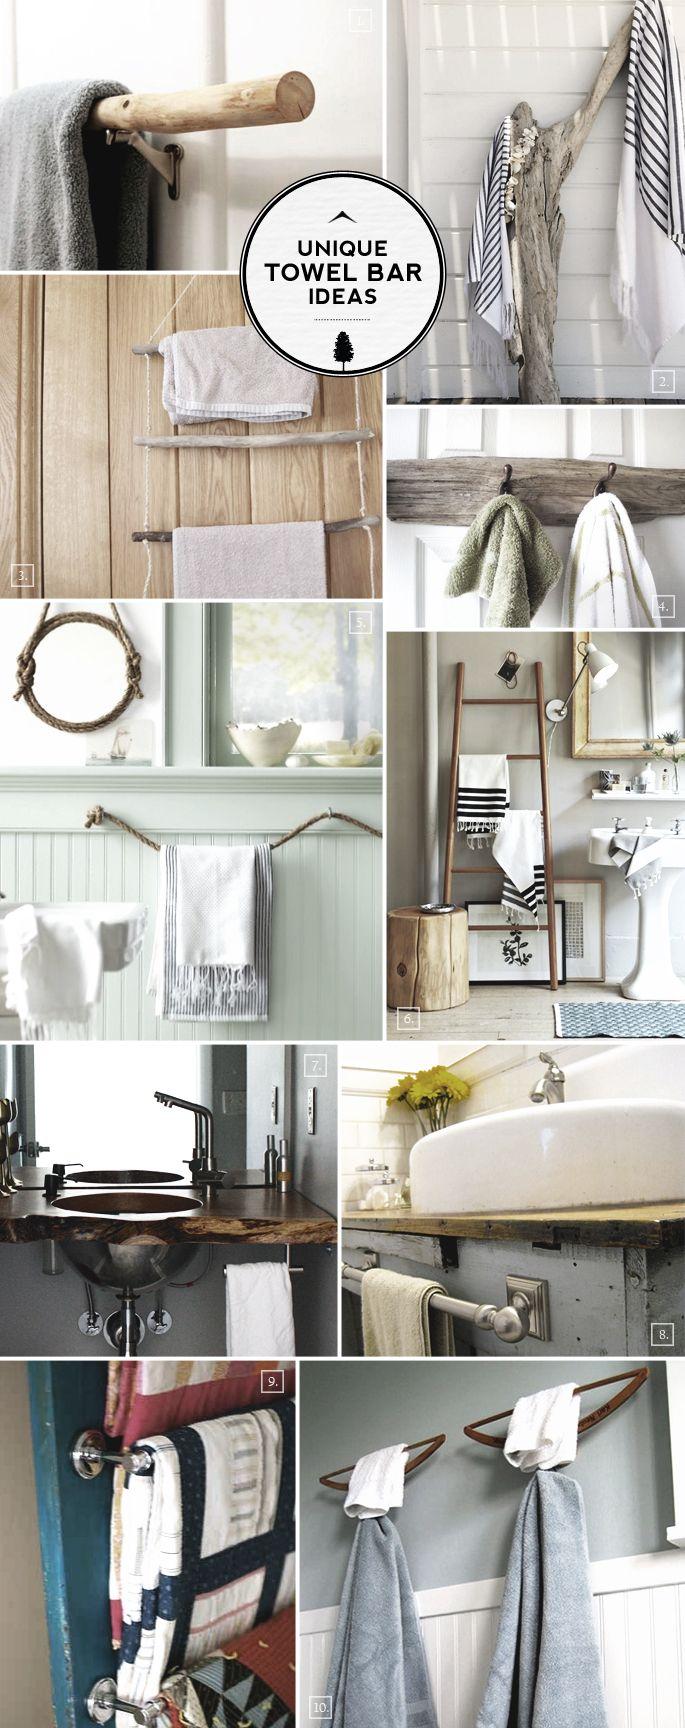 Unique Ideas For Bathroom Towel Bars, Unique Towel Bars For Bathrooms